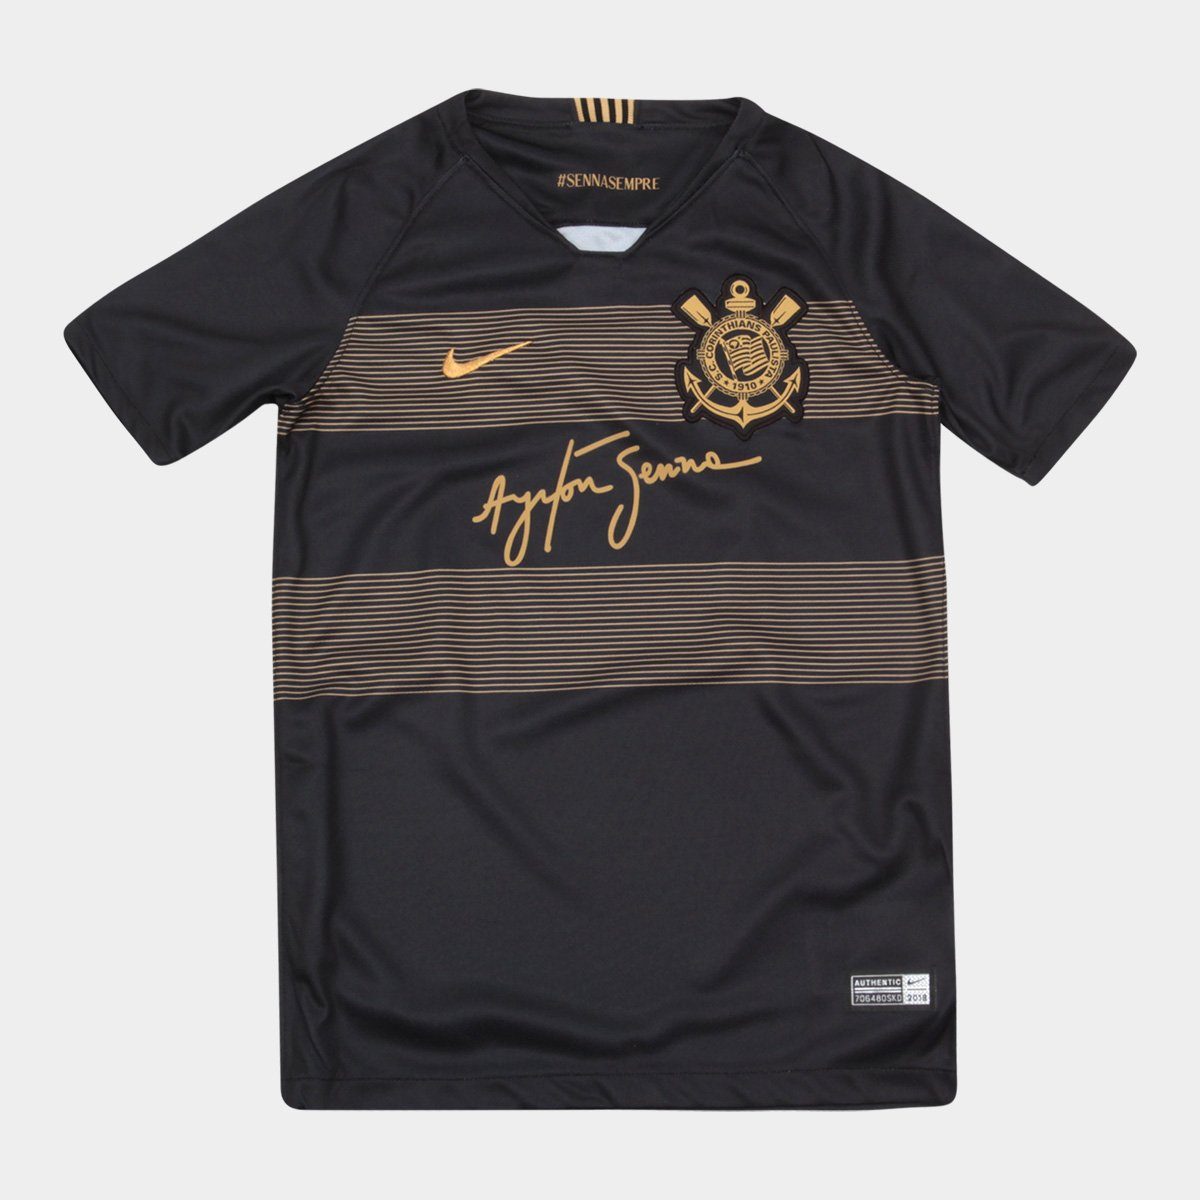 c8ce1be4a9 Camisa Corinthians Infantil III 2018 s n° - Torcedor Nike